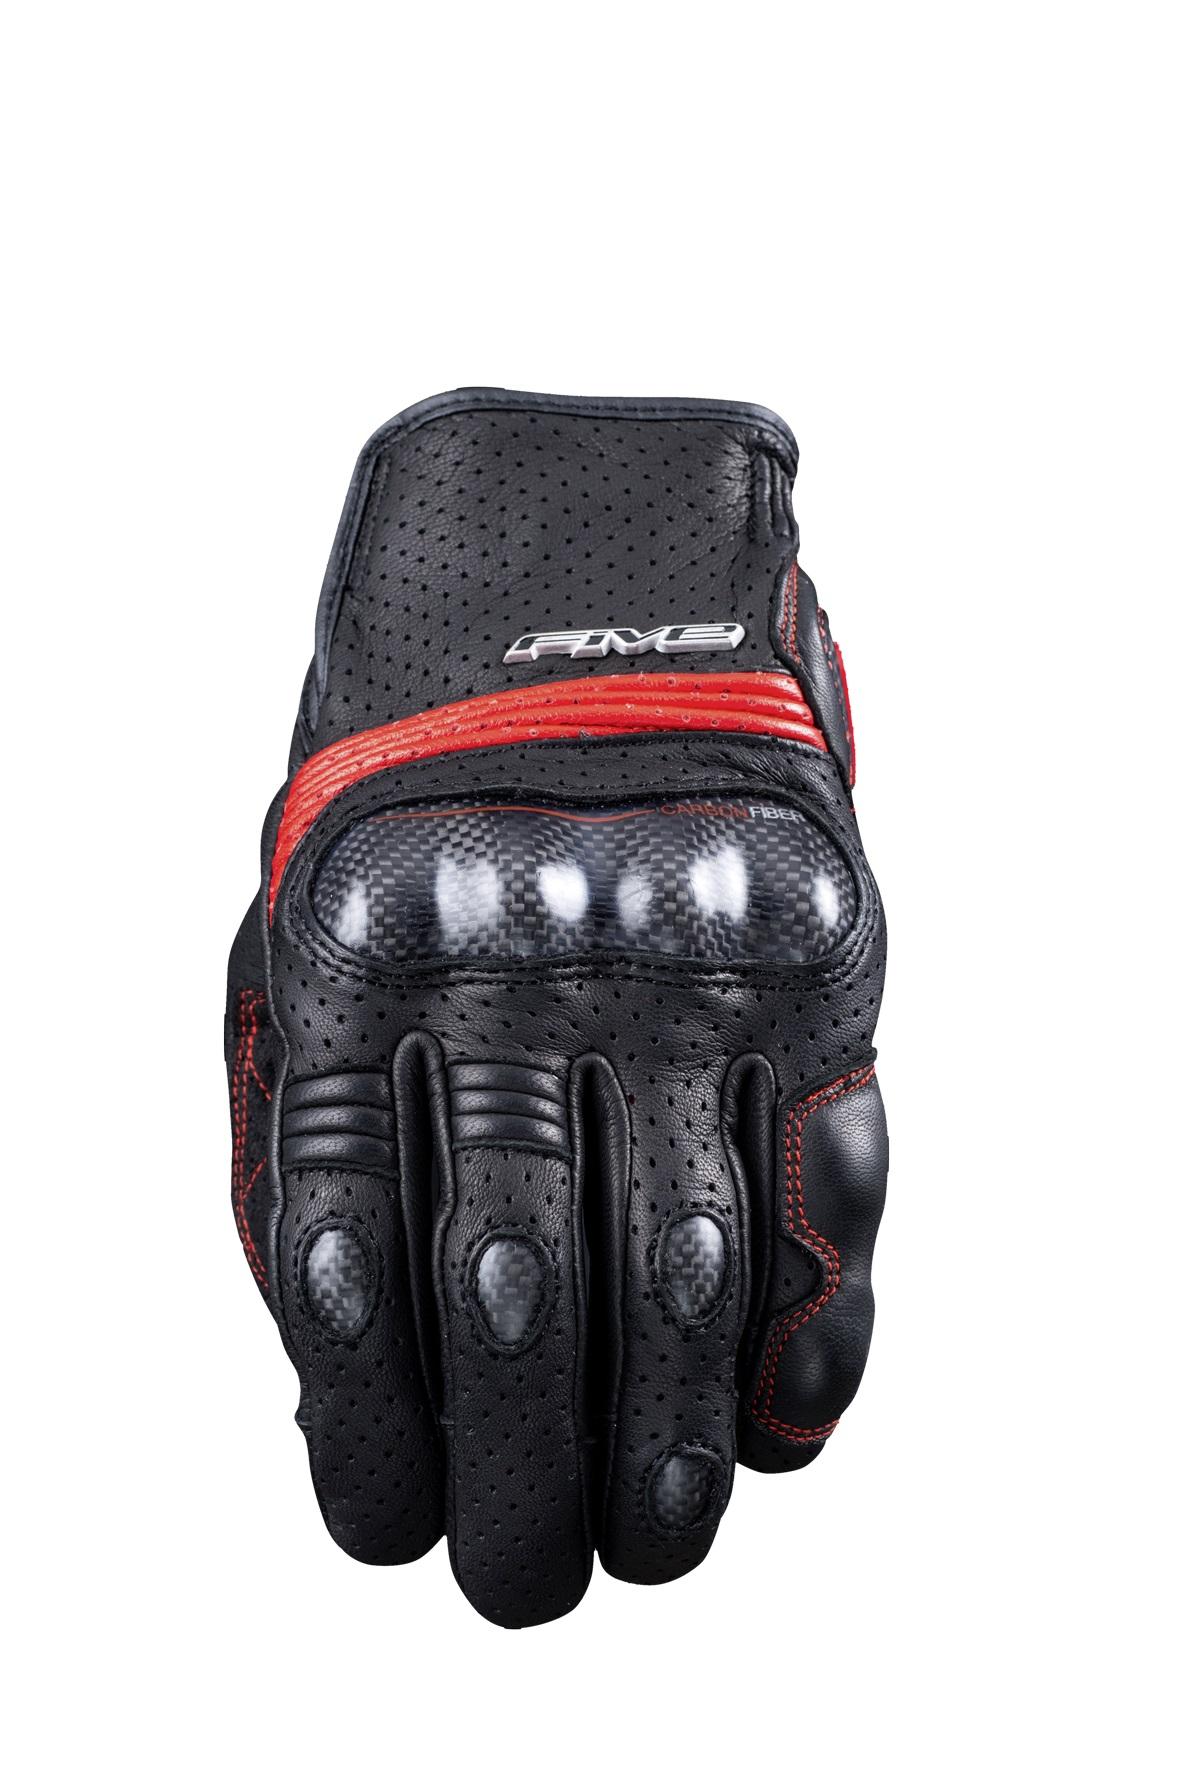 Five Sportcity S Carbon Guantes Motorista Negro Rojo S